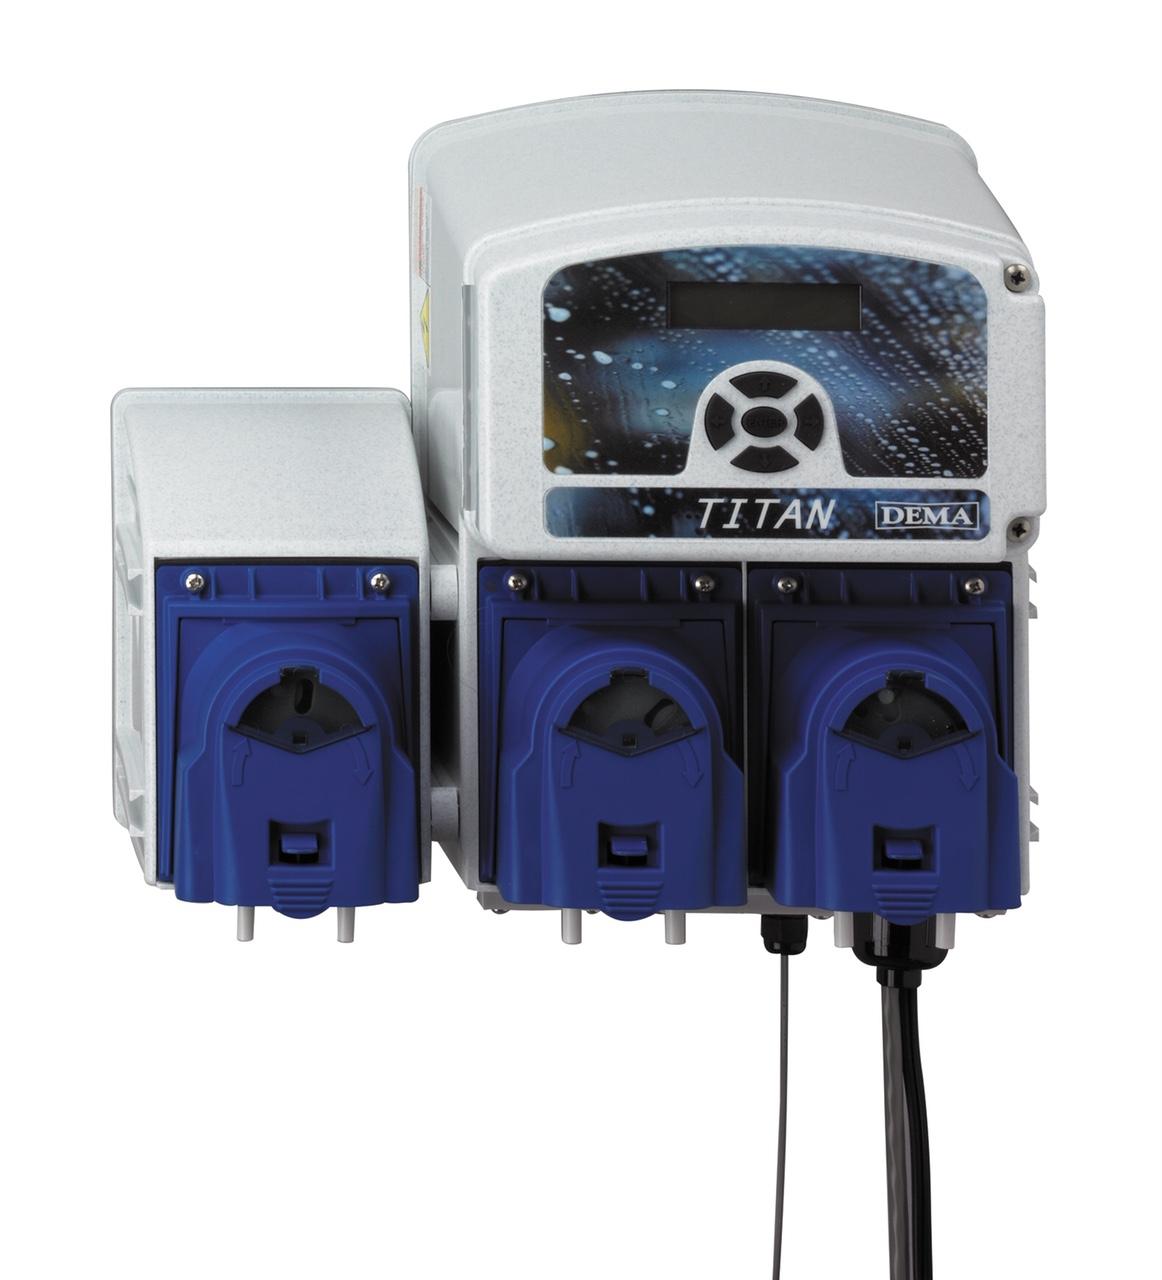 Dema Titan II, Warewash Chemical Dispenser Pumps